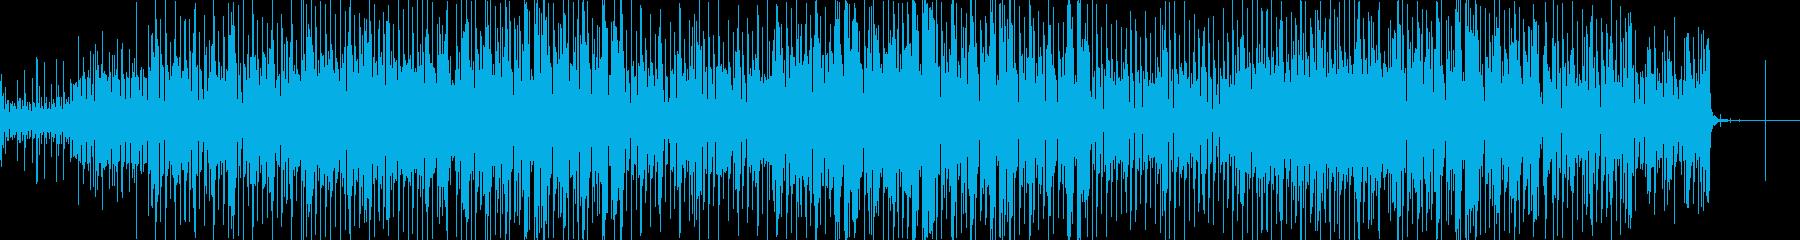 Electro-R&Bインストゥル...の再生済みの波形